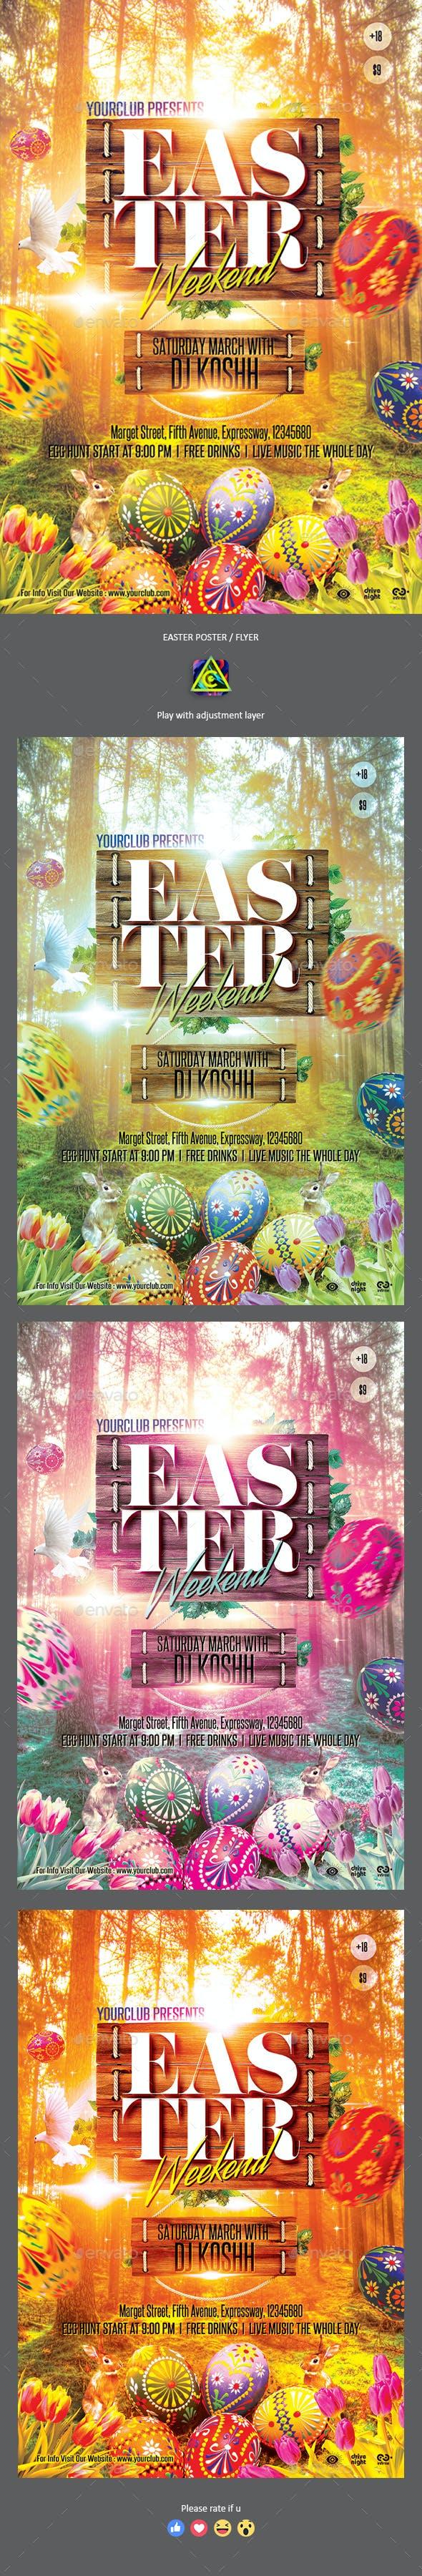 Easter Poster / Flyer